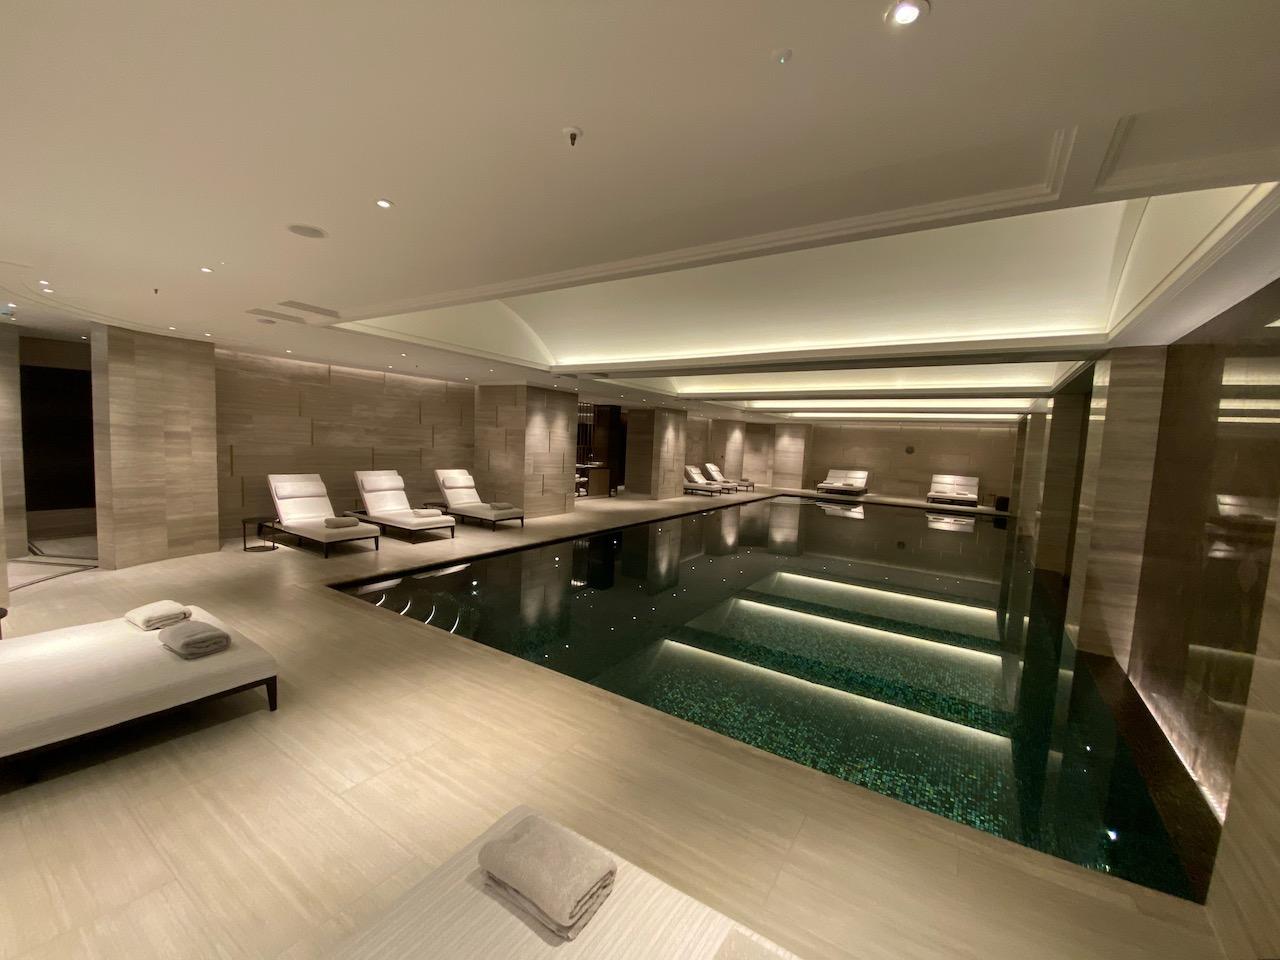 The Langley indoor pool